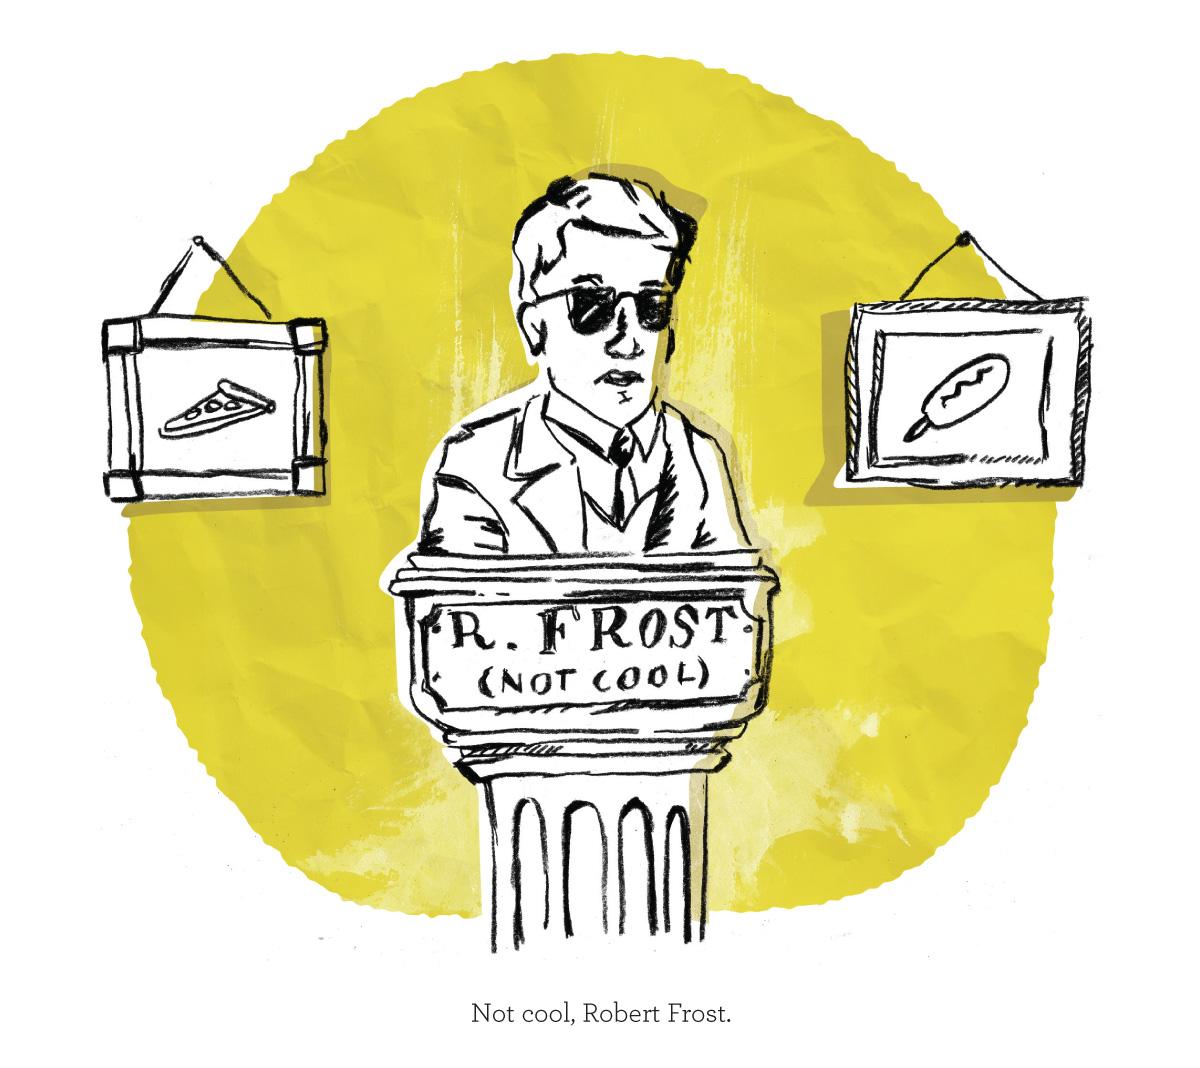 Not cool, Robert Frost. Pep talk kid president illustration.